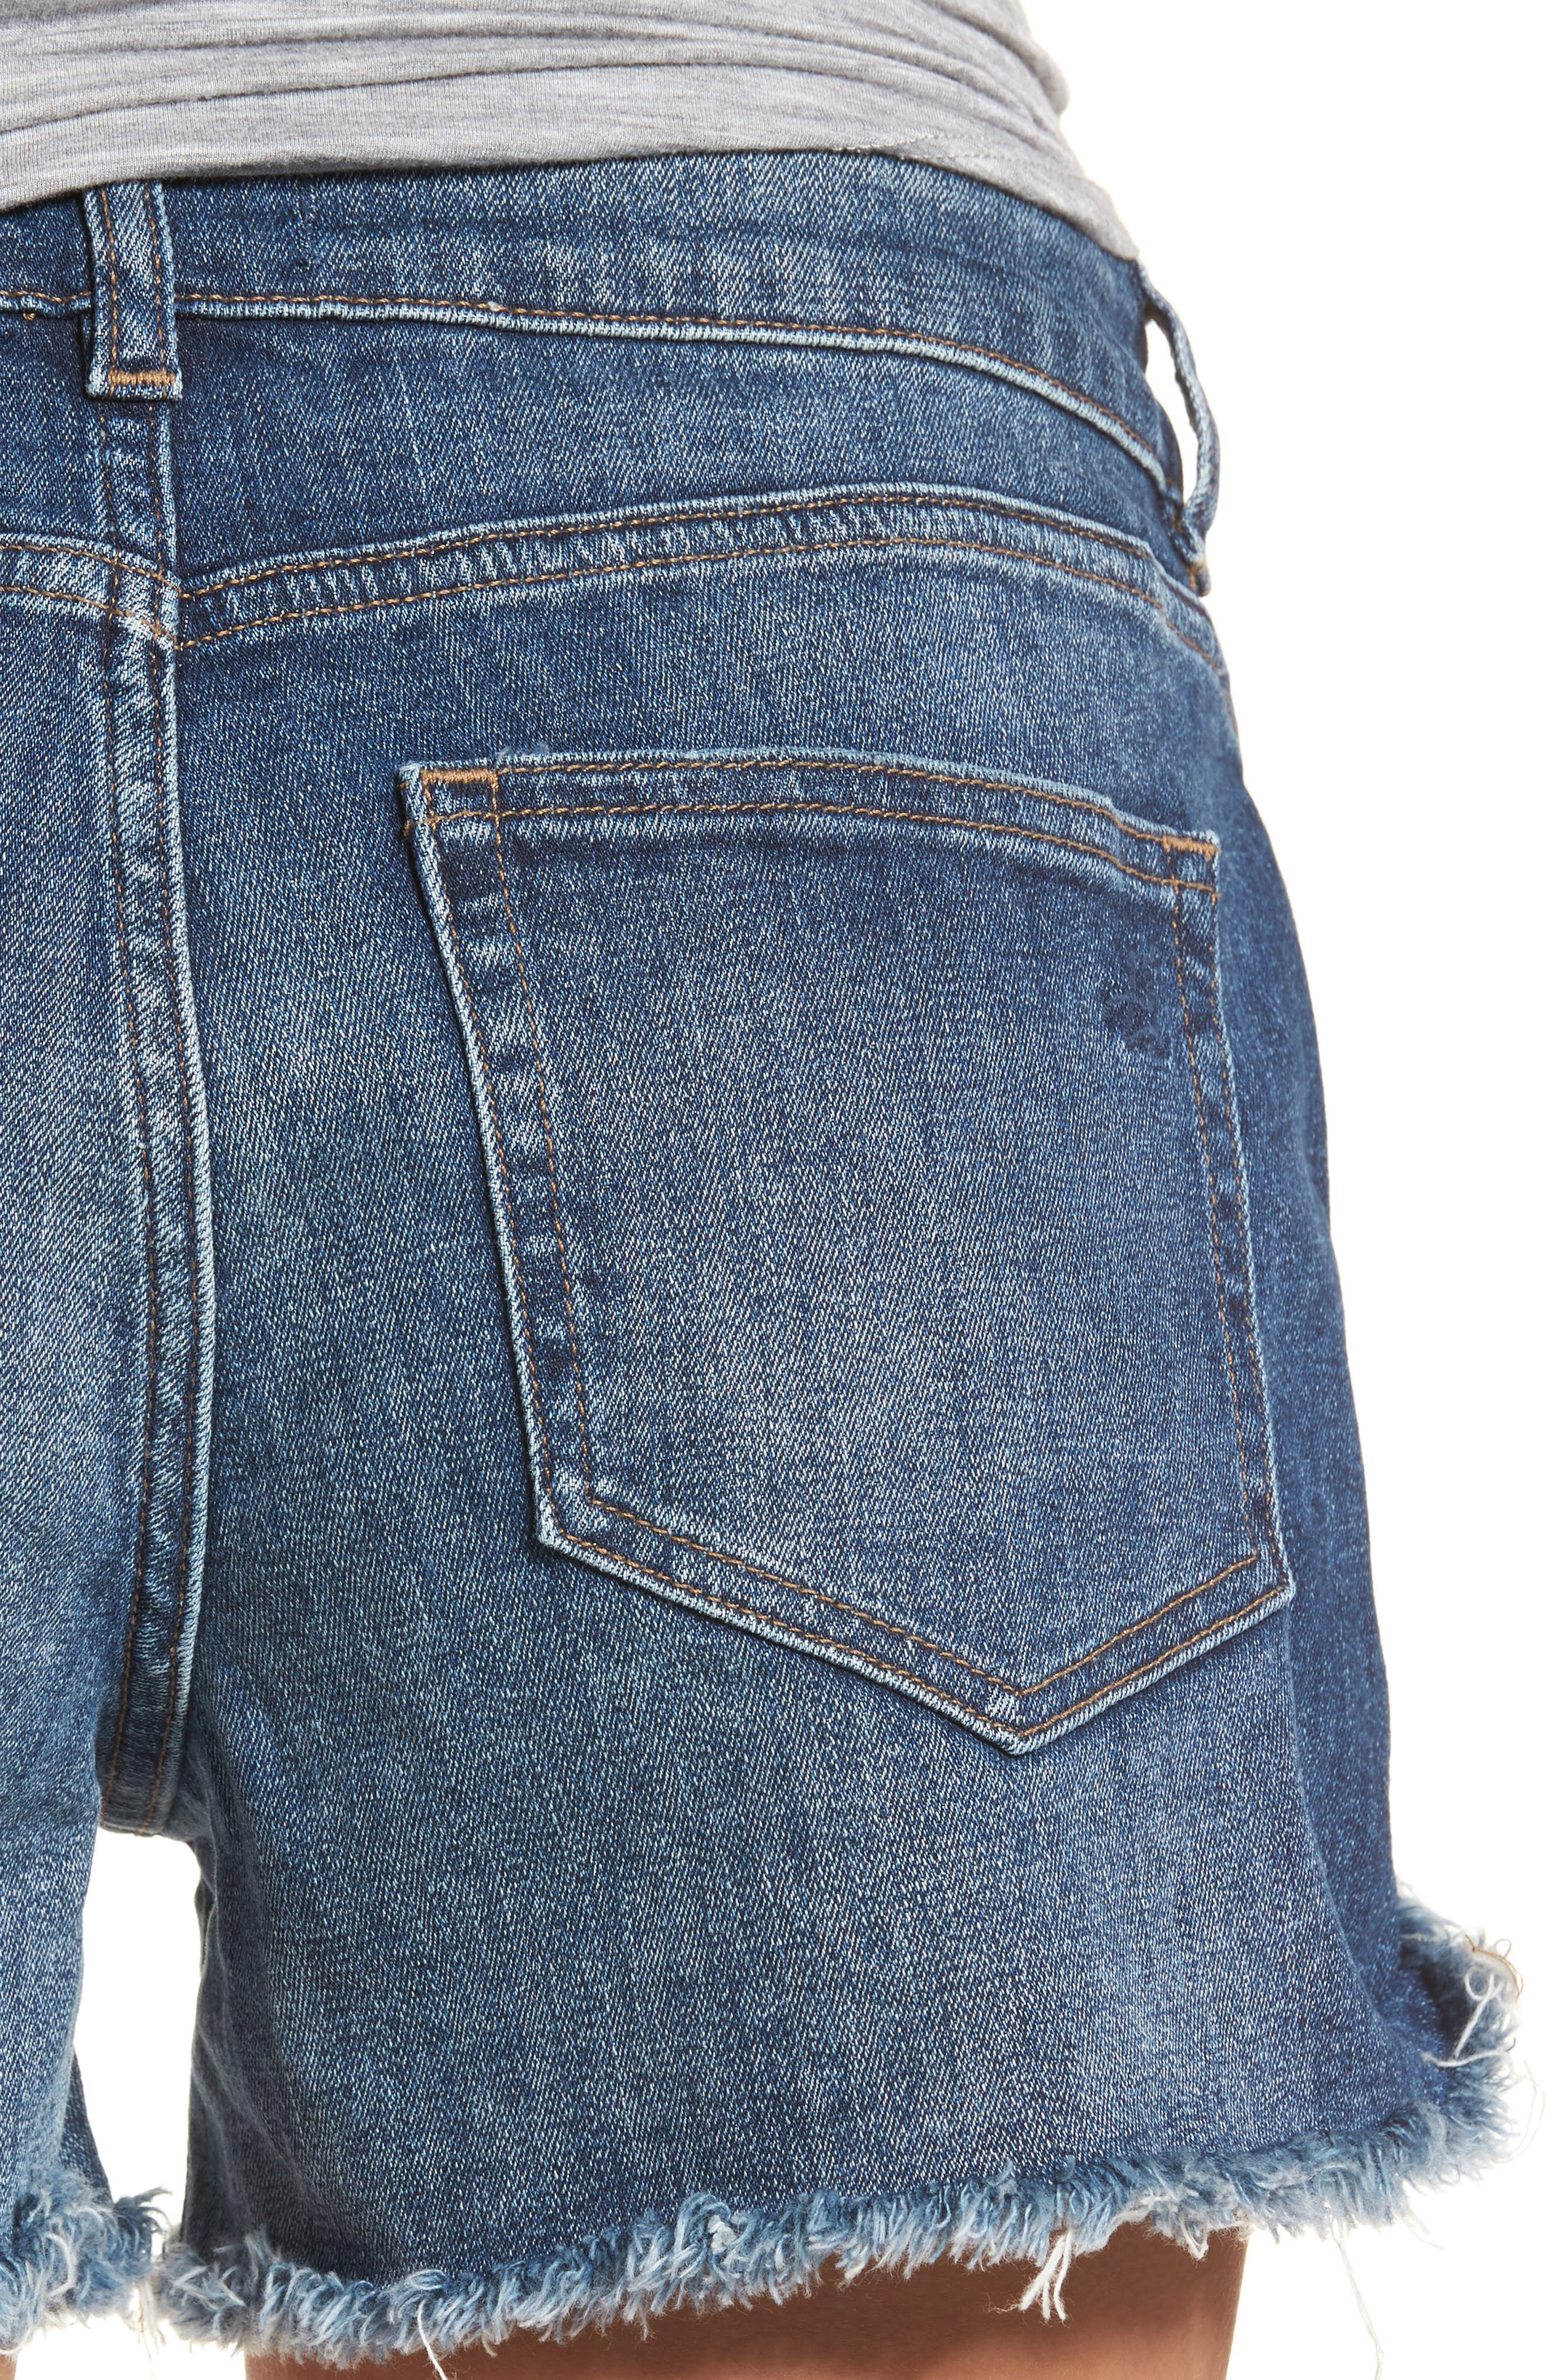 Karlie Cutoff Denim Boyfriend Shorts,                             Alternate thumbnail 4, color,                             425